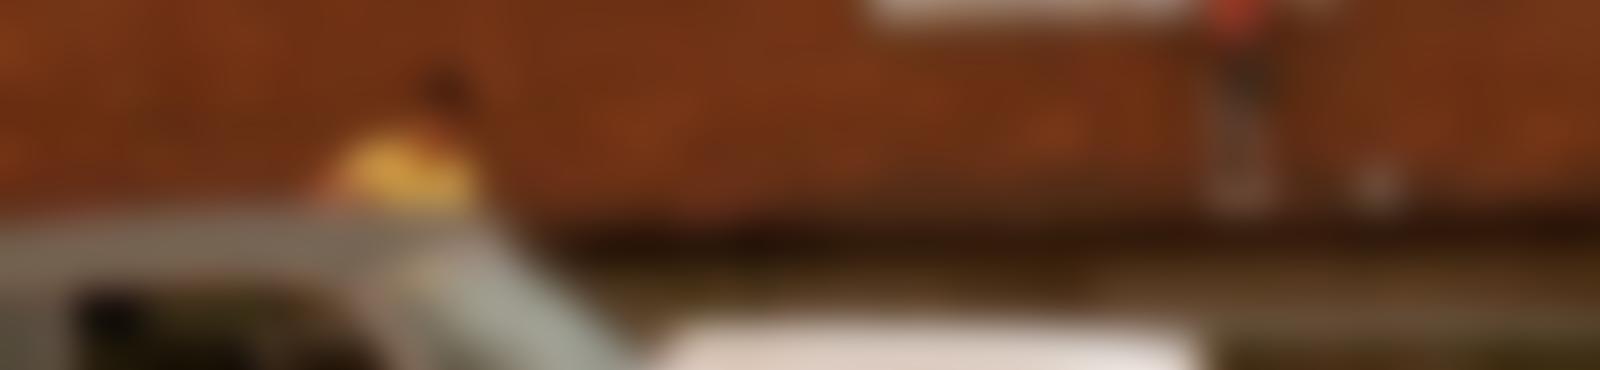 Blurred f9cdf426 e170 4b96 8222 730cb67dcea2